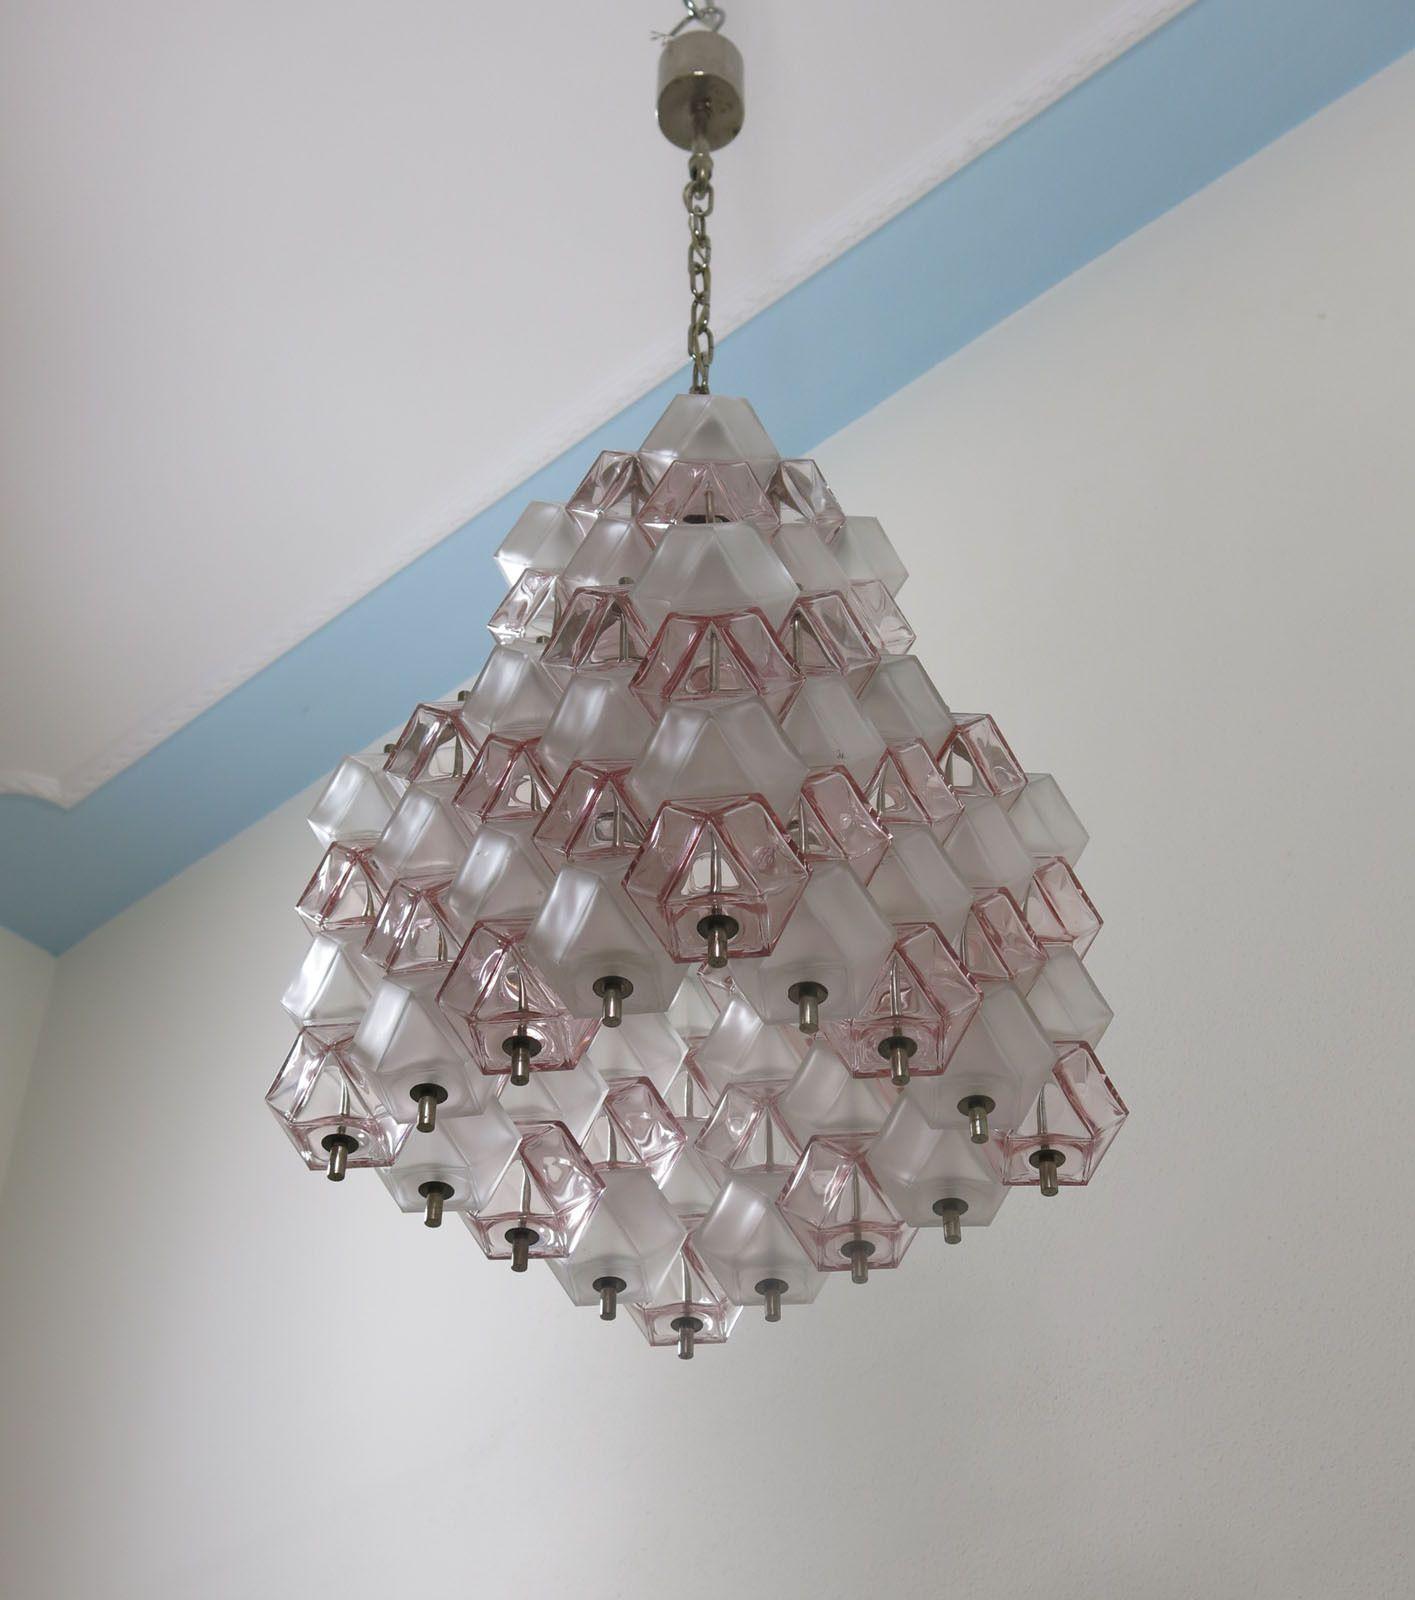 50s italian vintage murano poliedri glass chandelier venini attr 50s italian vintage murano poliedri glass chandelier venini attr mazzega era ebay arubaitofo Choice Image